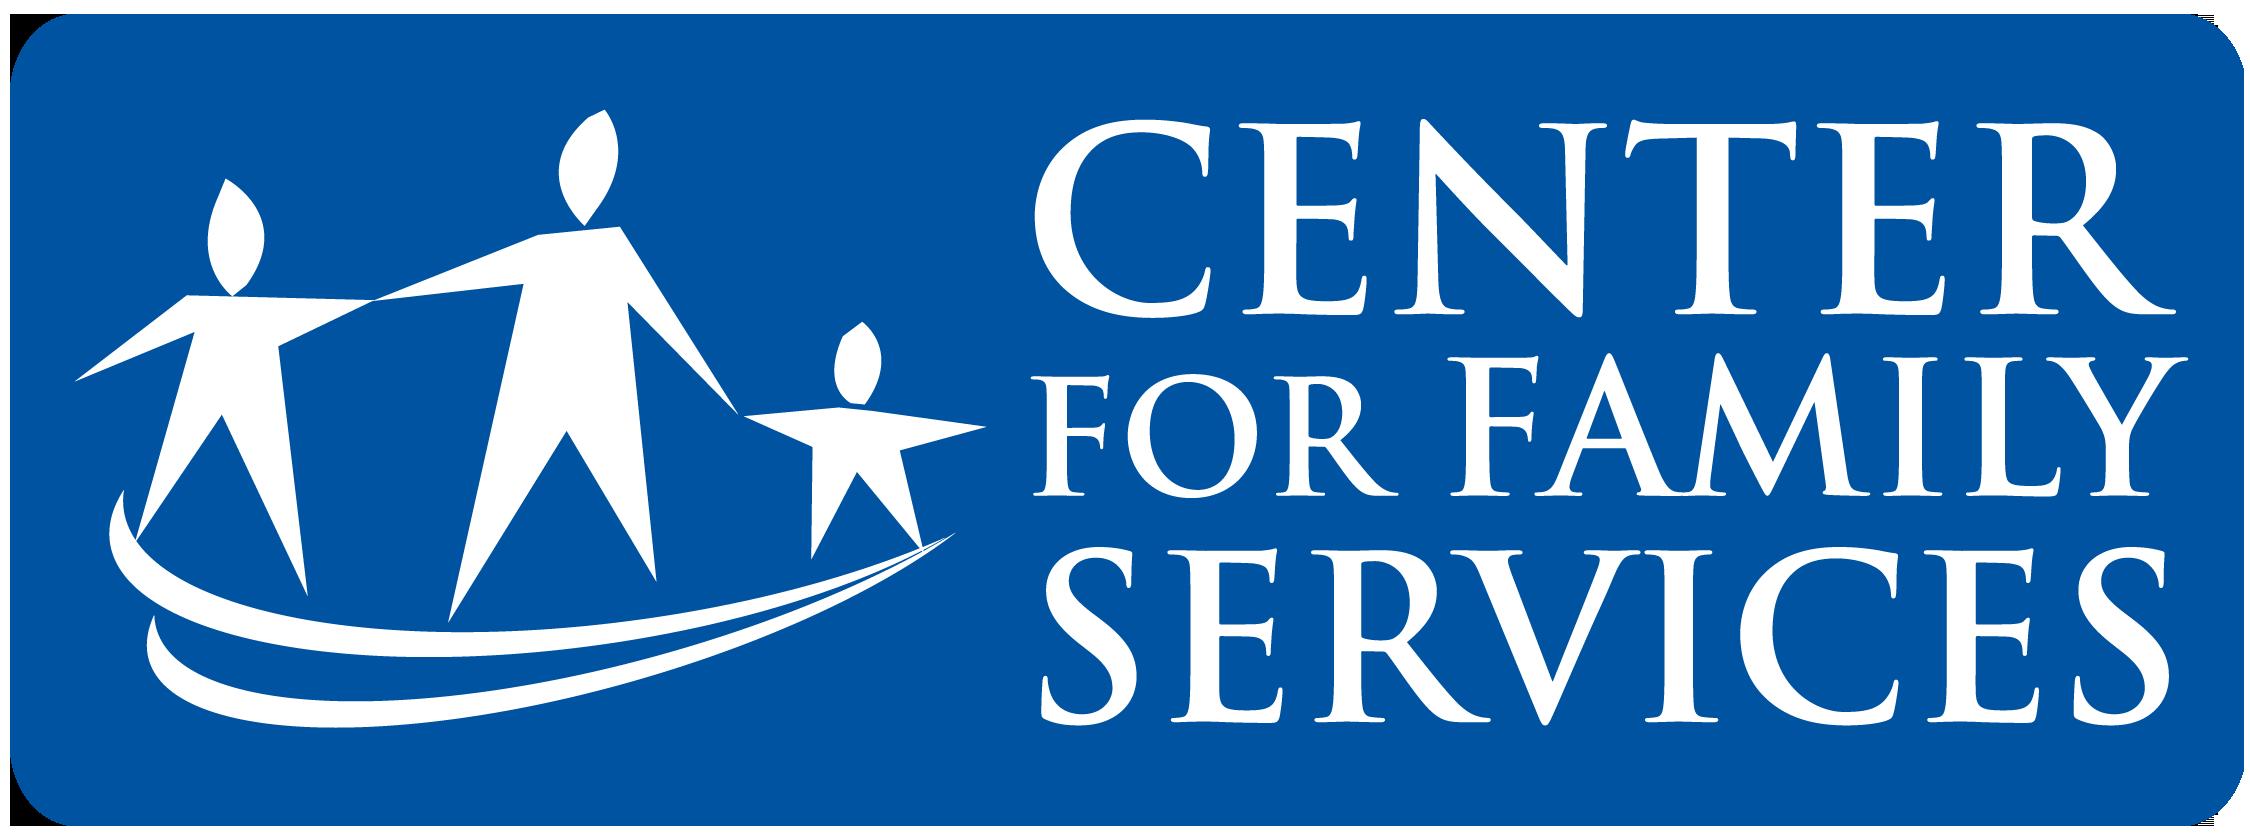 Center For Family Services, Inc. logo